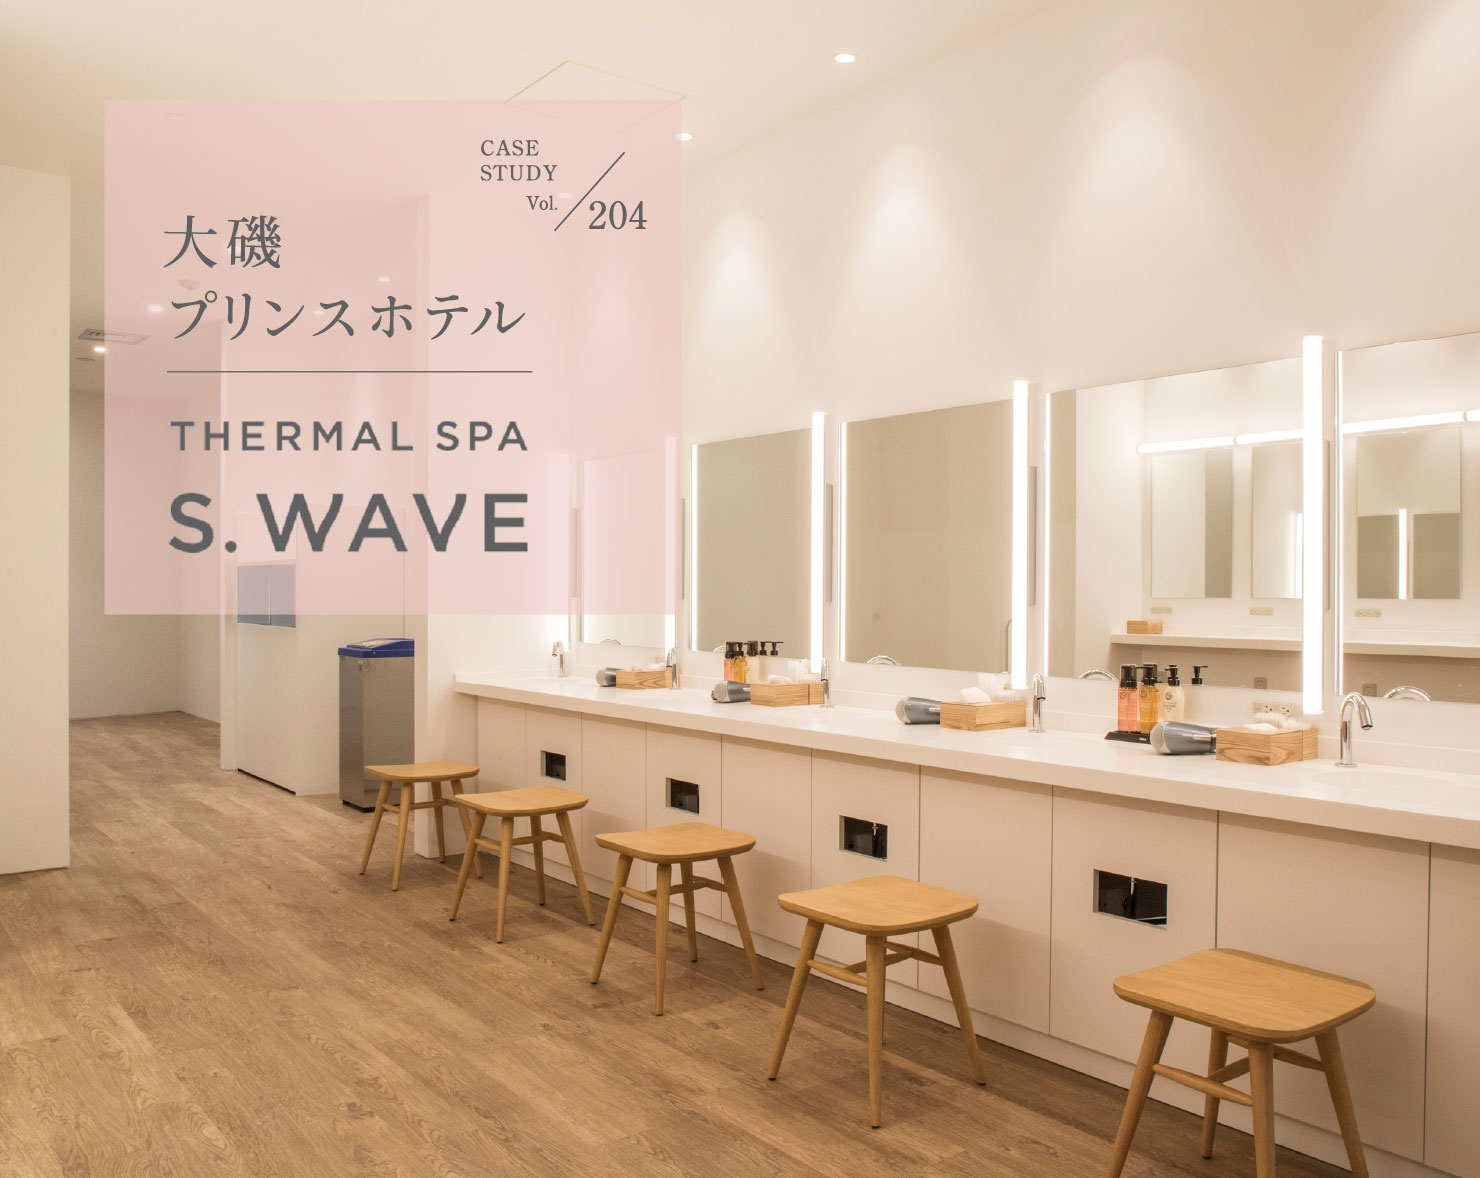 CASE STUDY Vol.204 大磯プリンスホテル THERMAL SPA S.WAVE